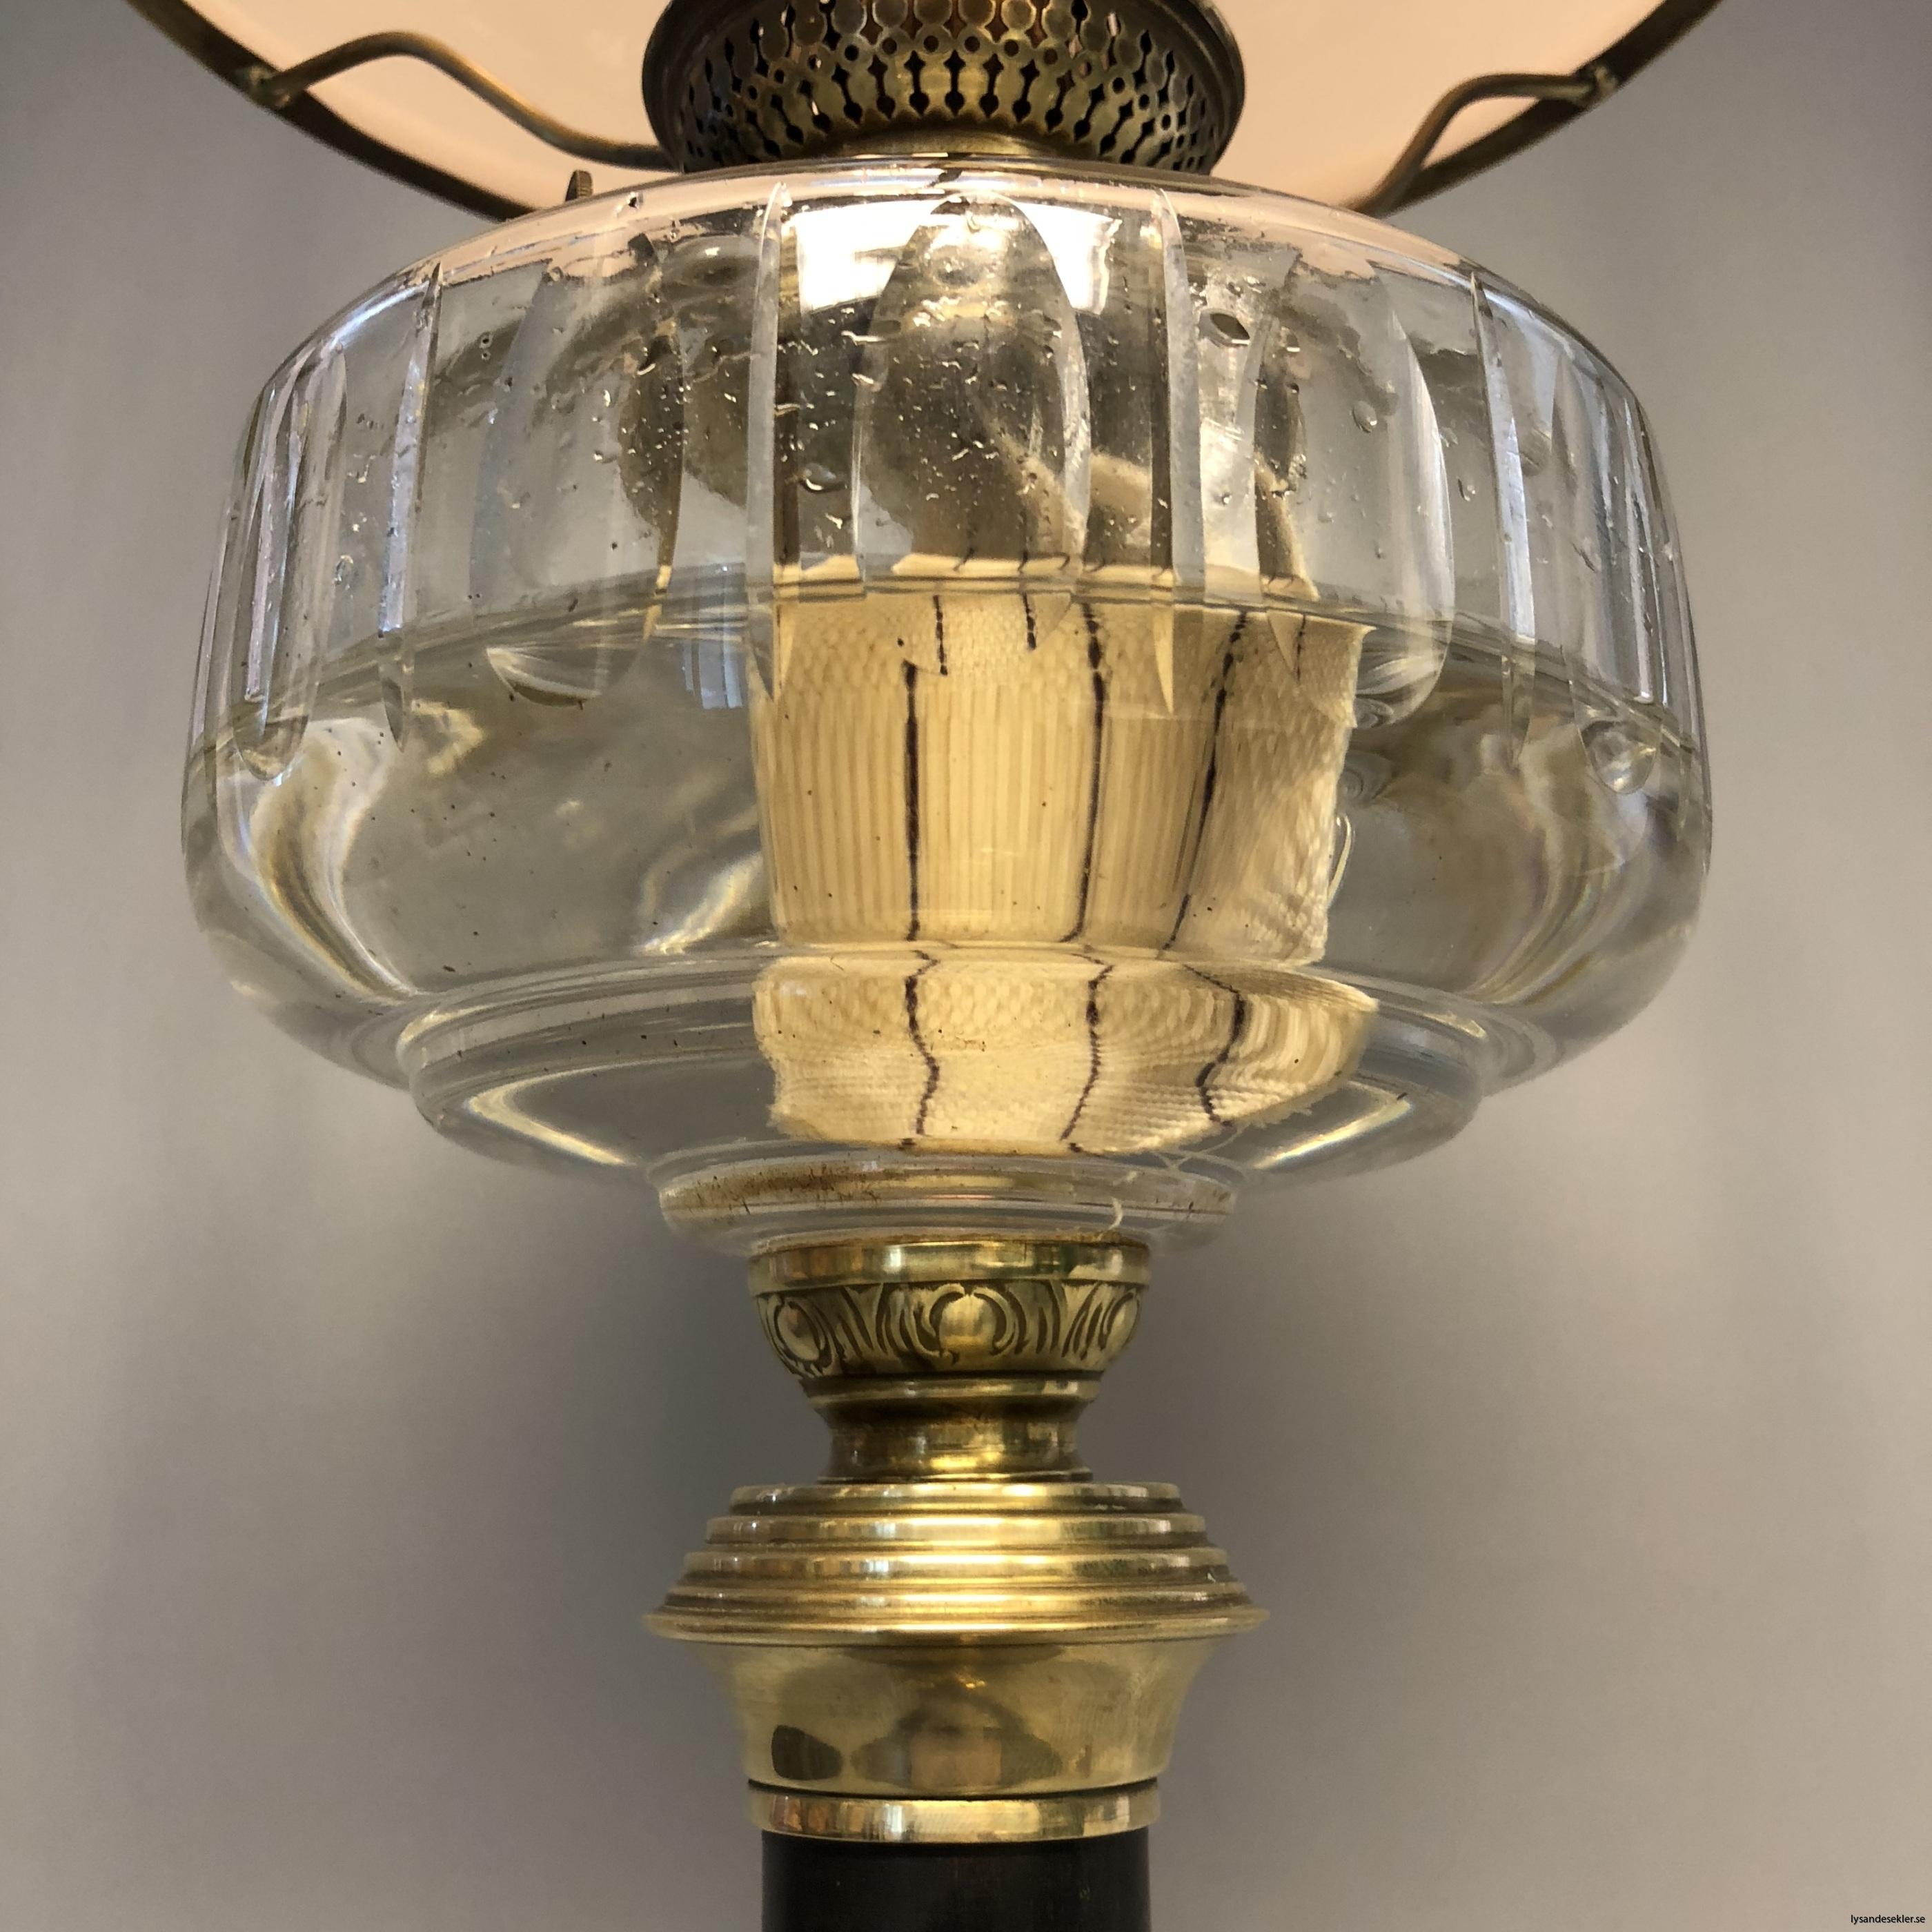 fotogenlampa fotogenlampor renoverad antik152